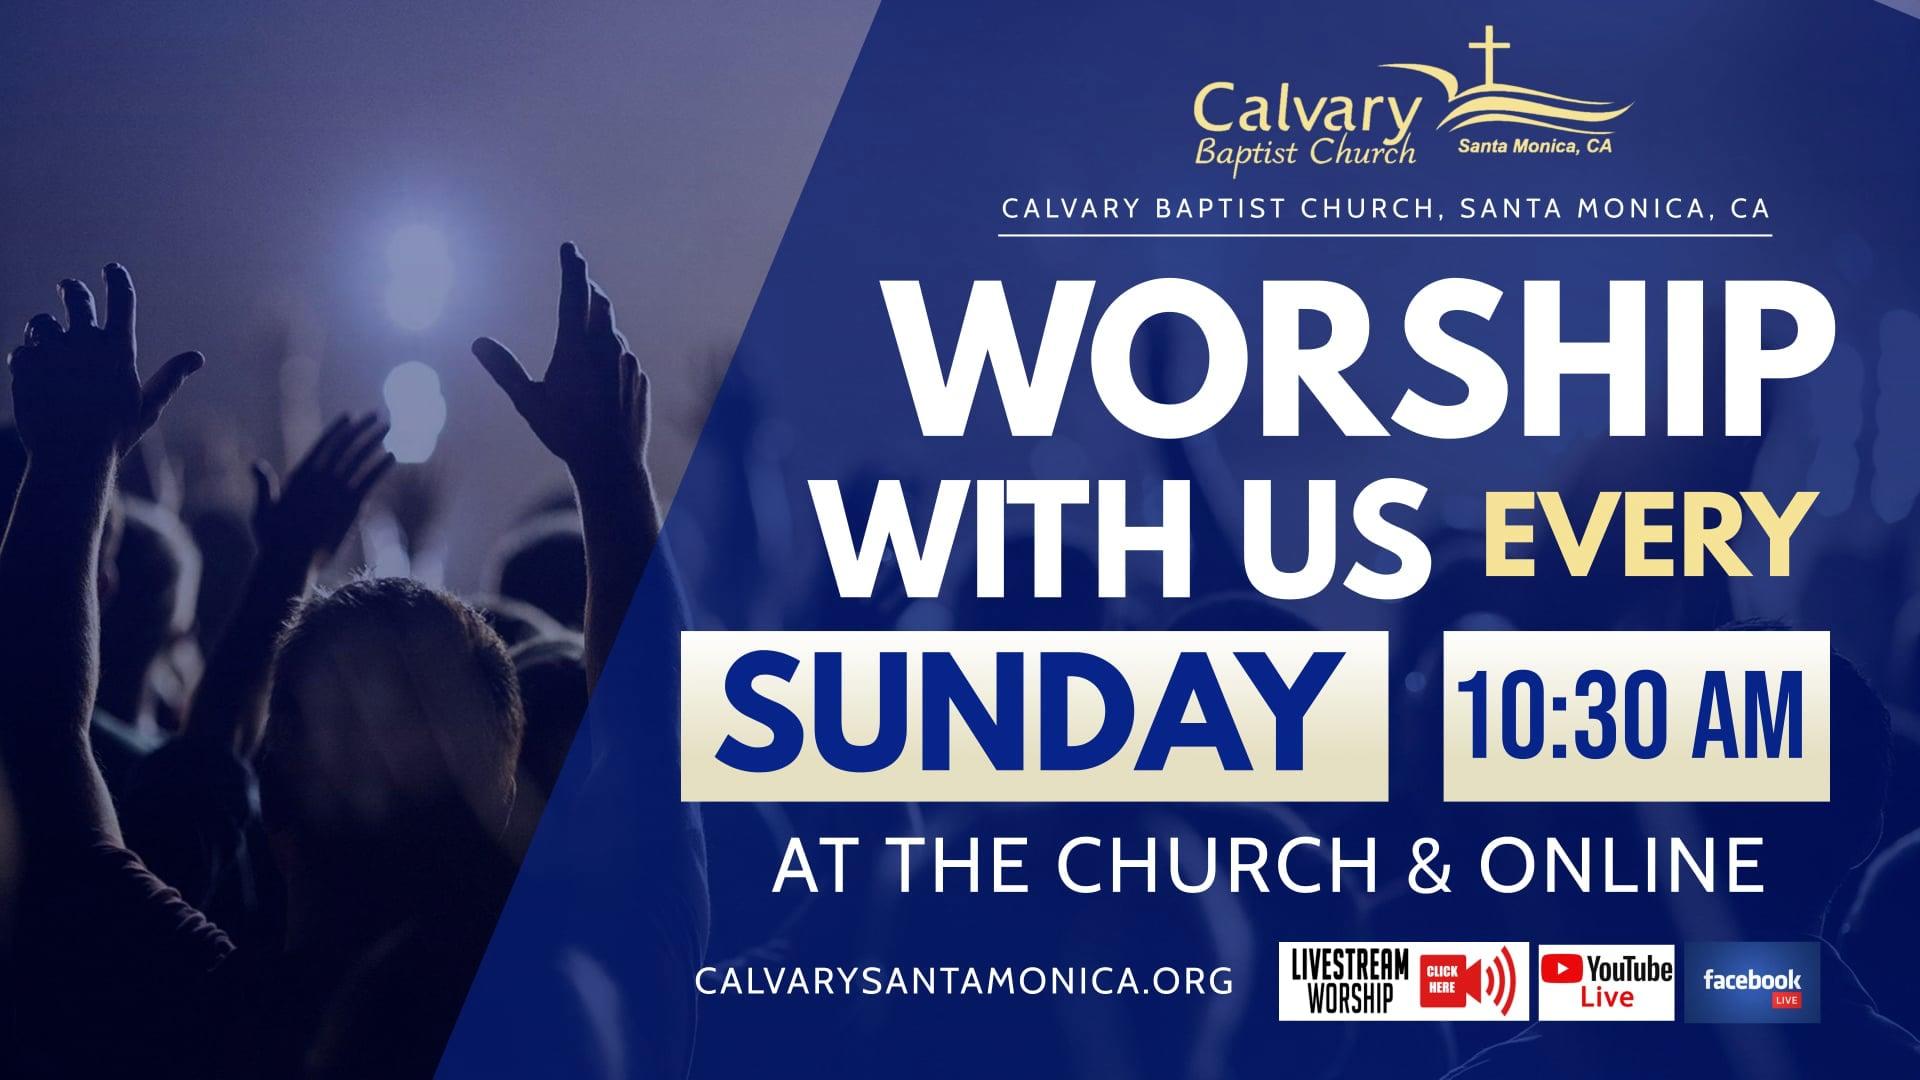 10.17.21 Calvary Baptist Church Worship Service